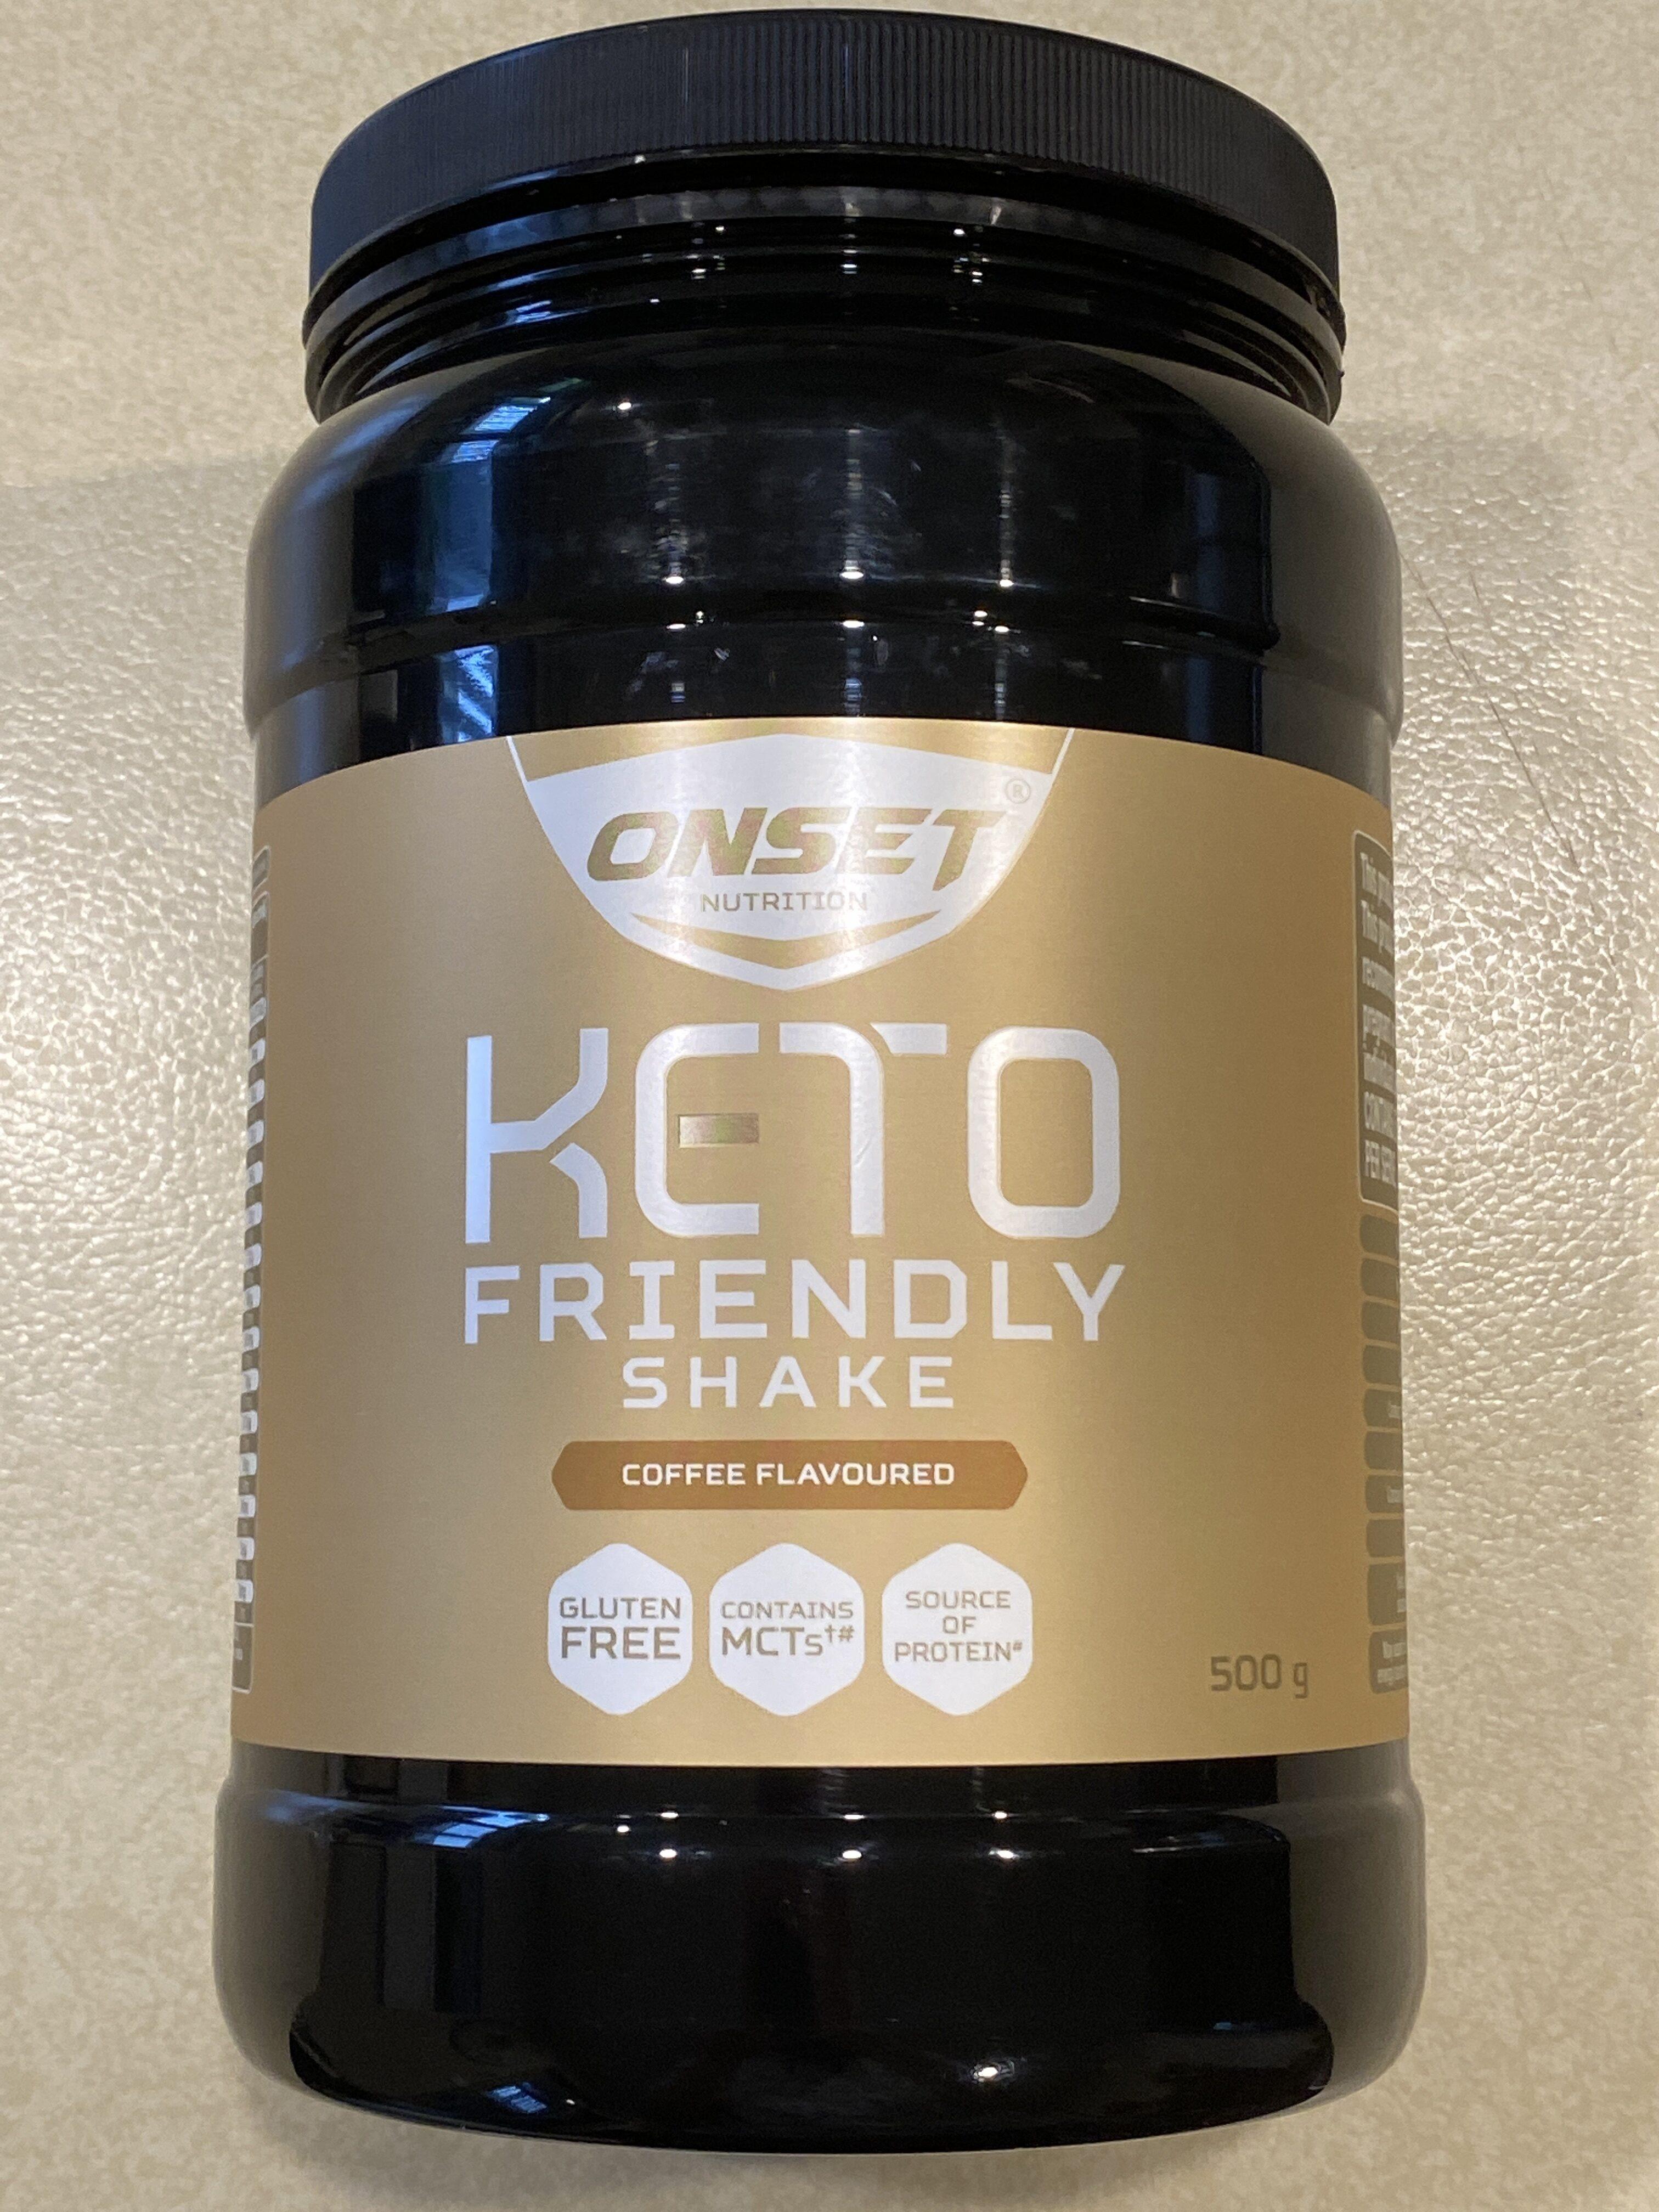 Keto Friendly Shake Coffee Flavoured - Product - en